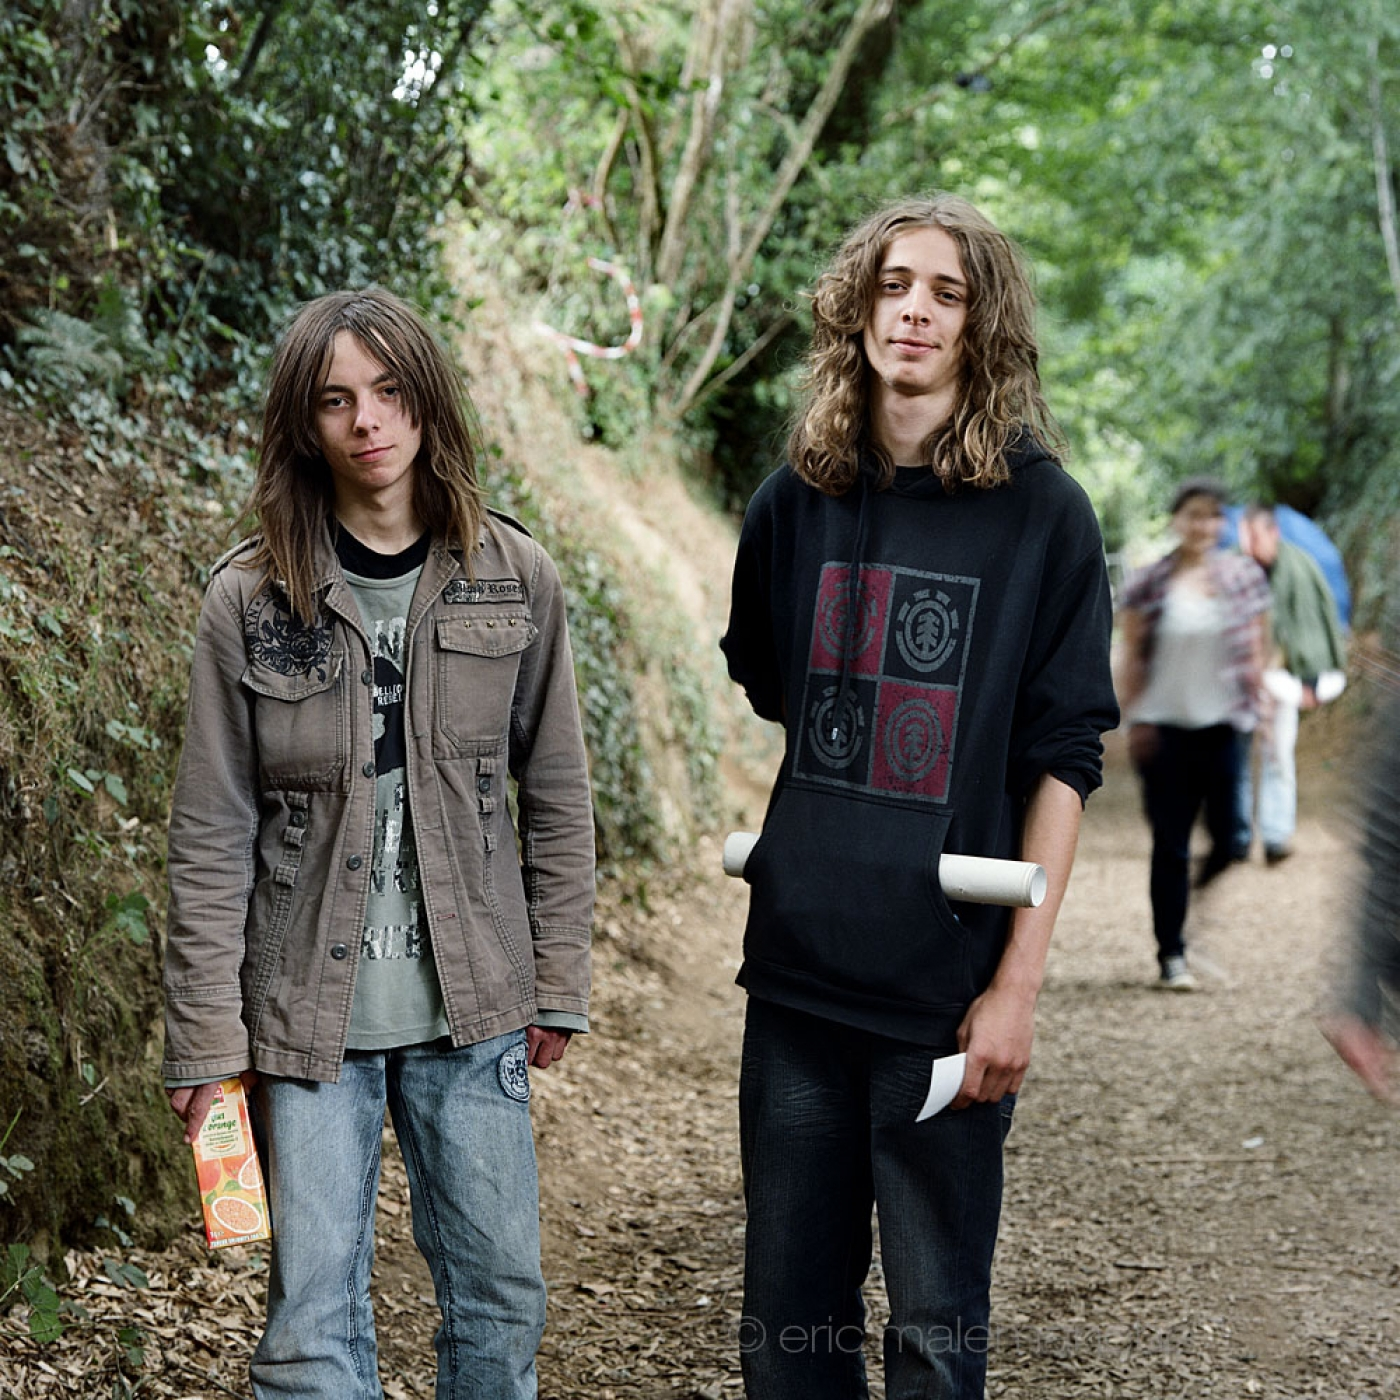 https://www.ericmalemanche.com/imagess/topics/rock-and-roll-attitudes/liste/rockandroll-attitudes-malemanche-007.jpg